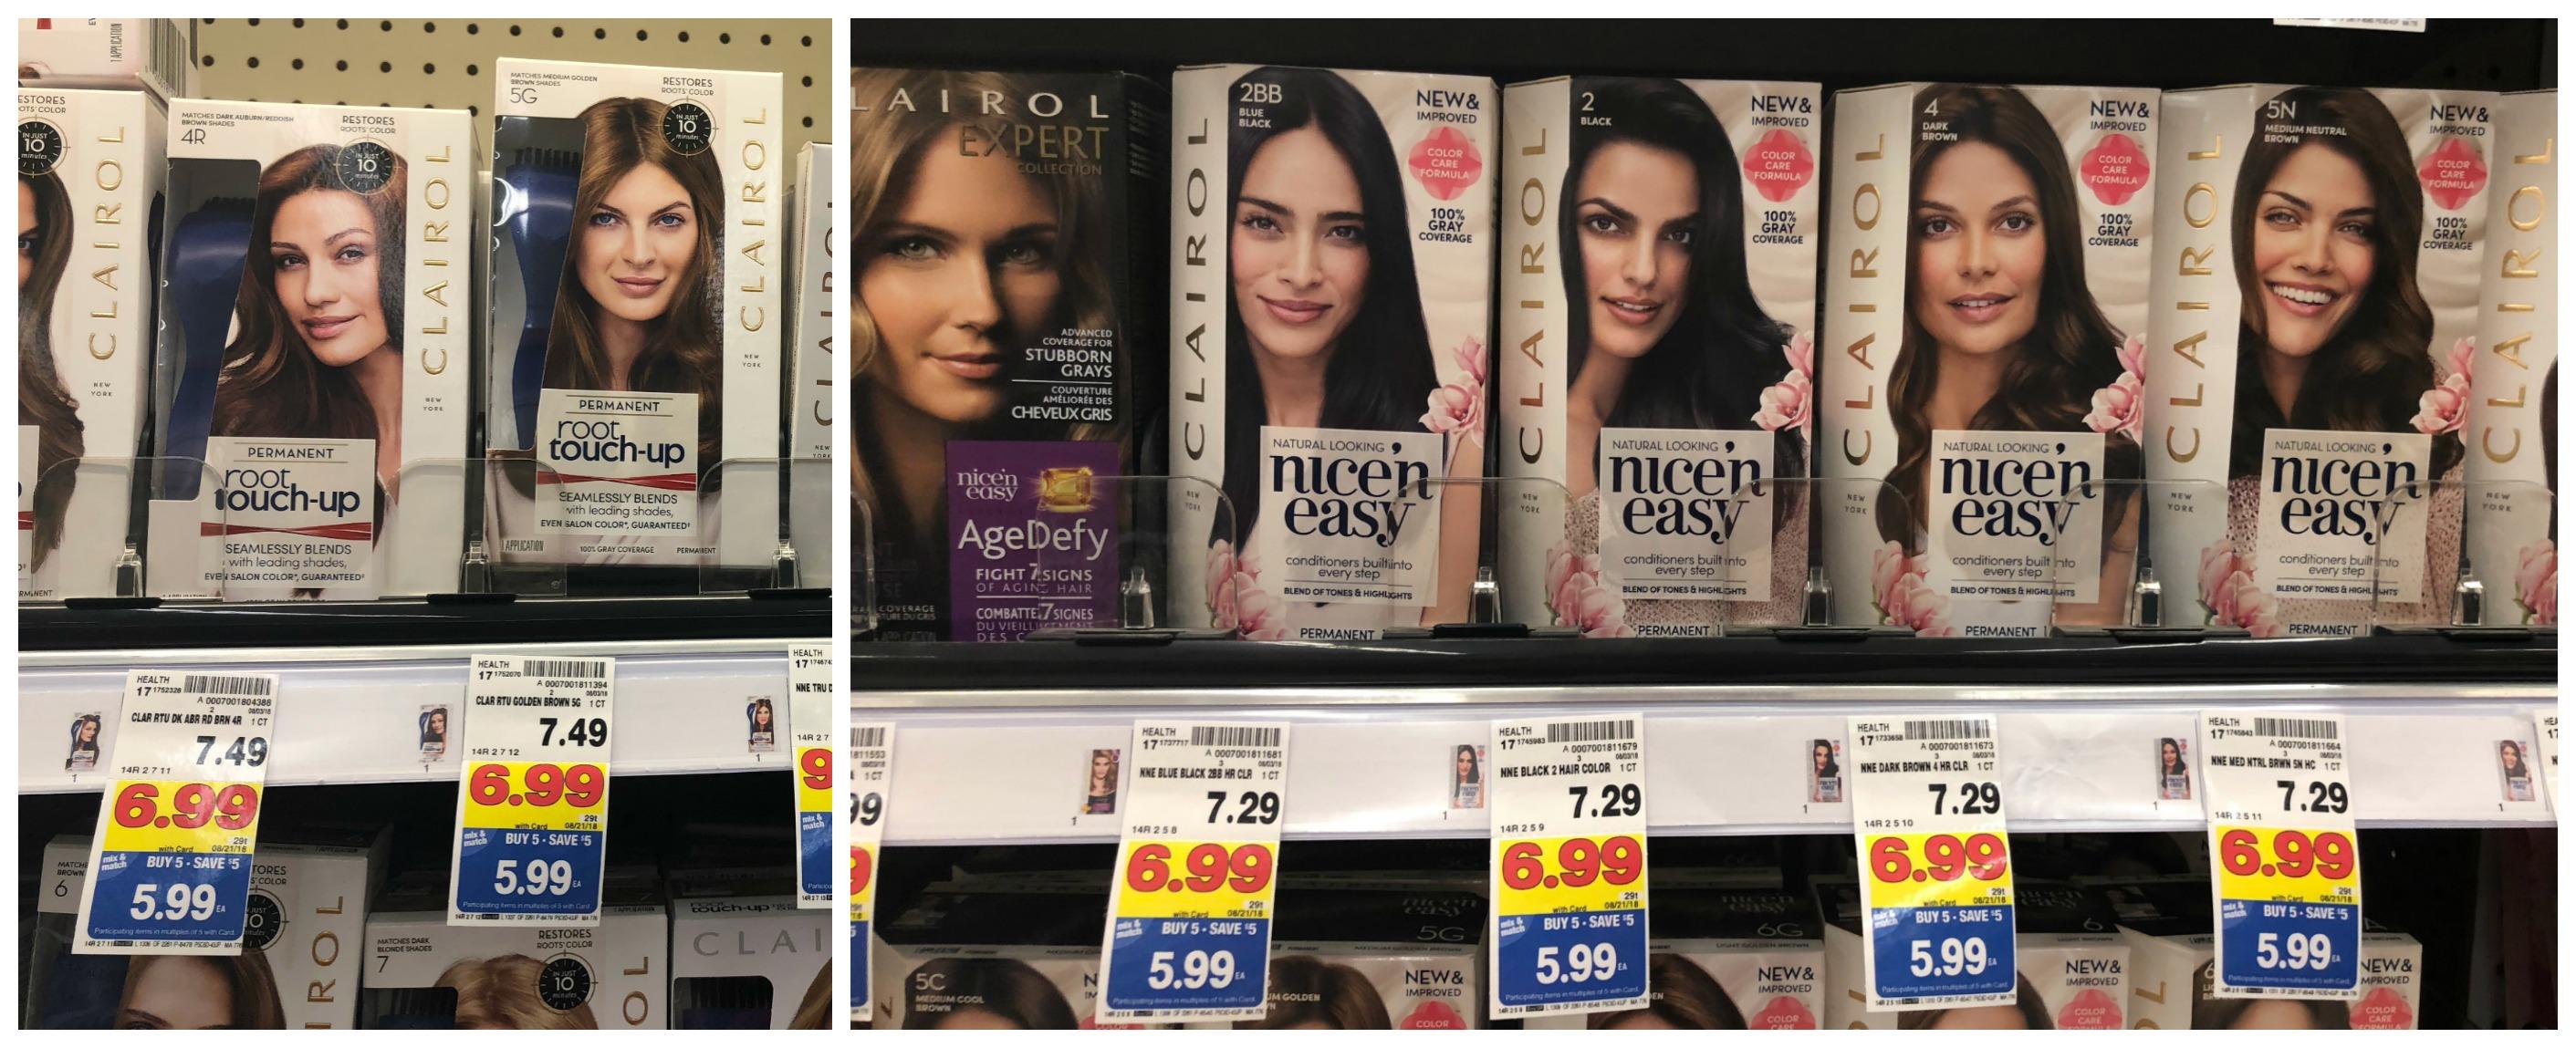 Grab Clairol Hair Color For As Low As 099 At Kroger Reg Price